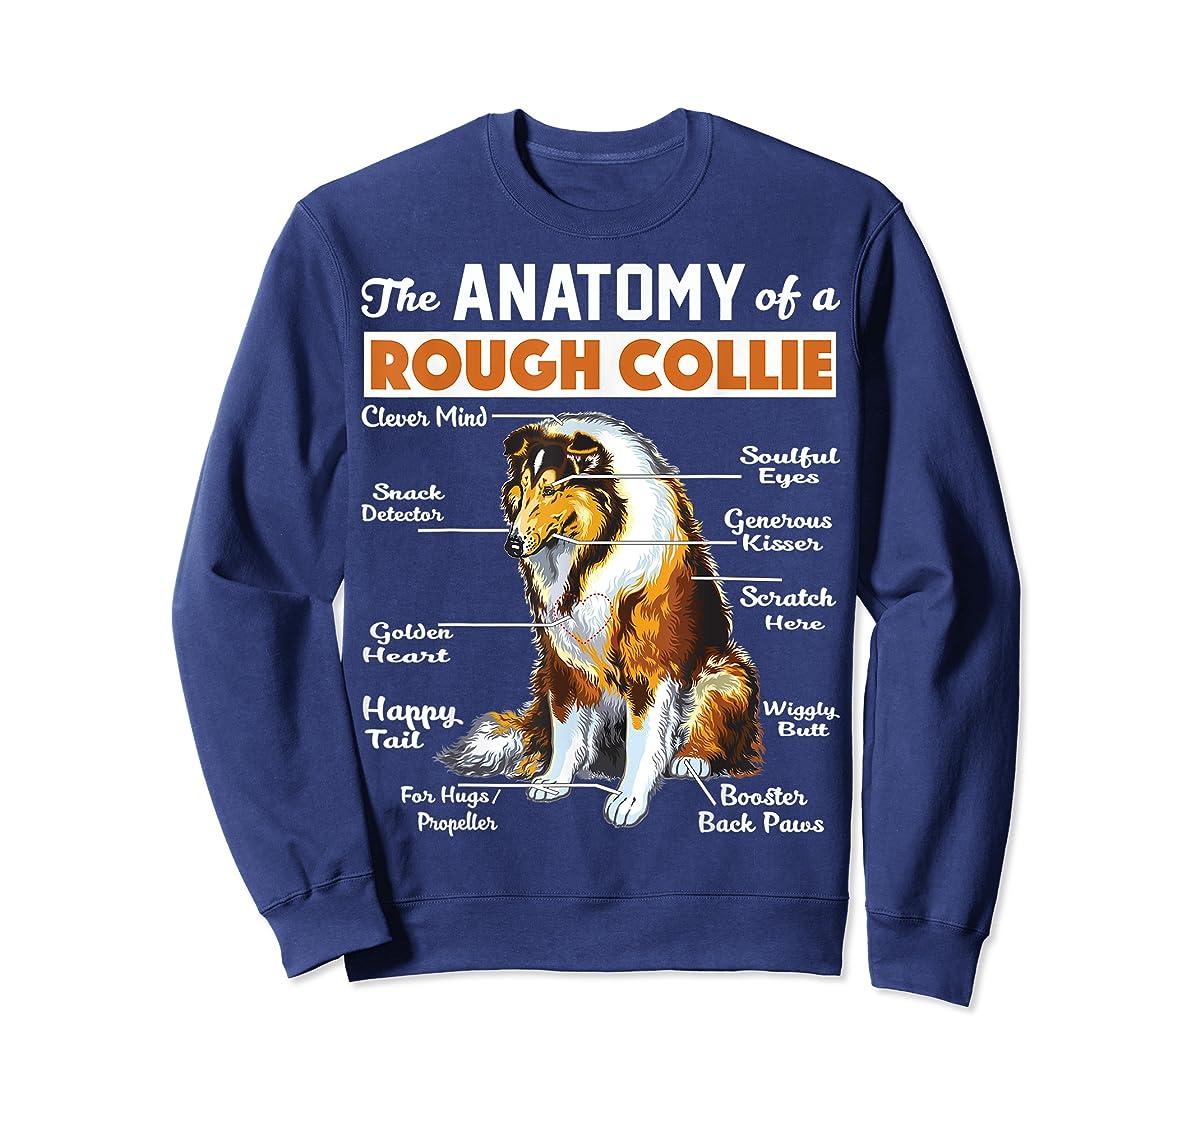 The Anatomy Of A Rough Collie-Sweatshirt-Navy